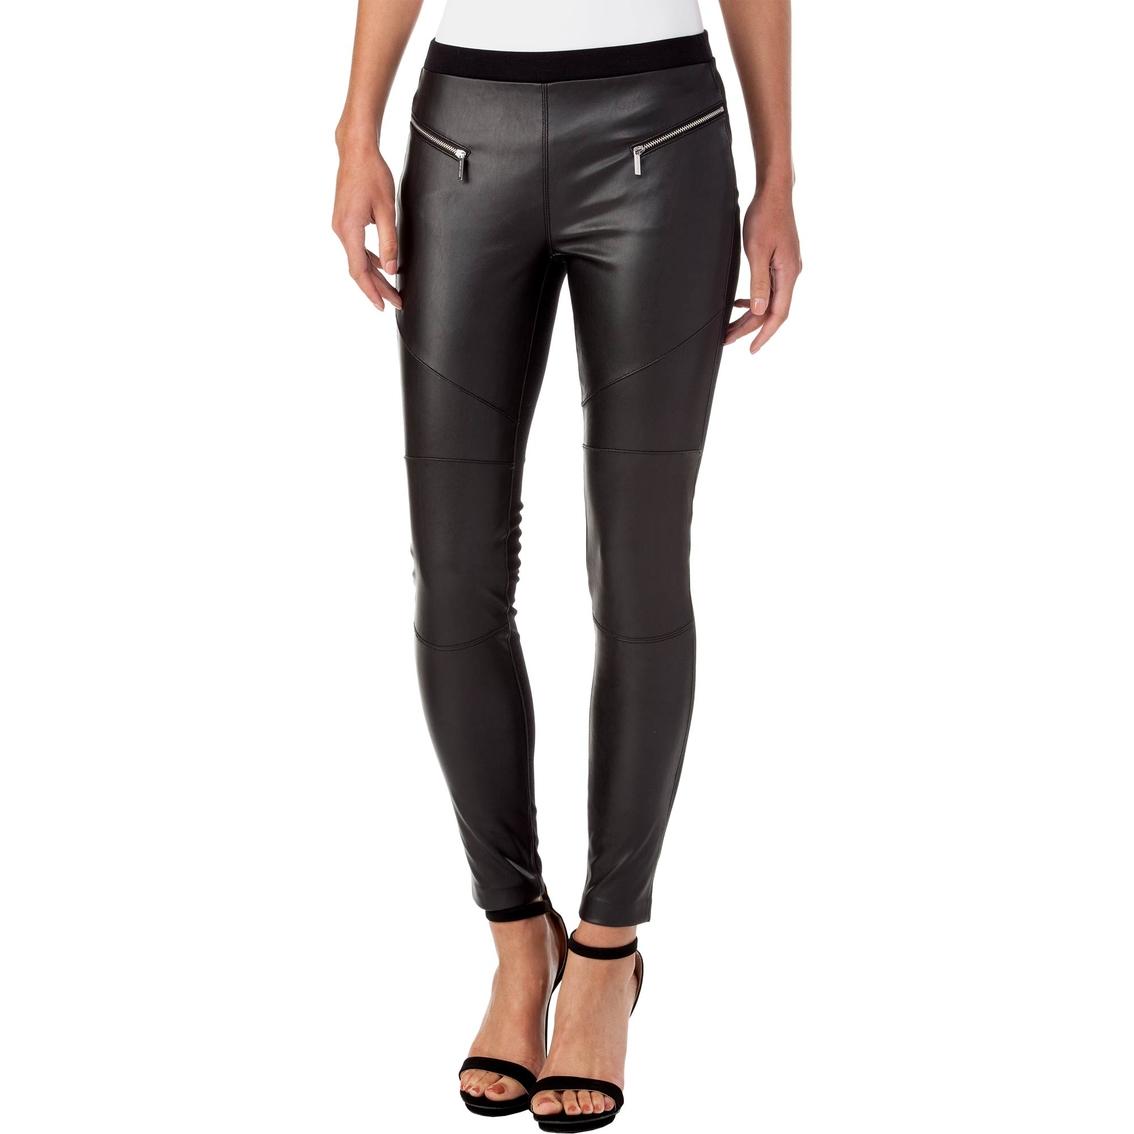 e920b2f4b5645b Michael Kors Faux Leather Front Moto Legging | Apparel | Shop The ...